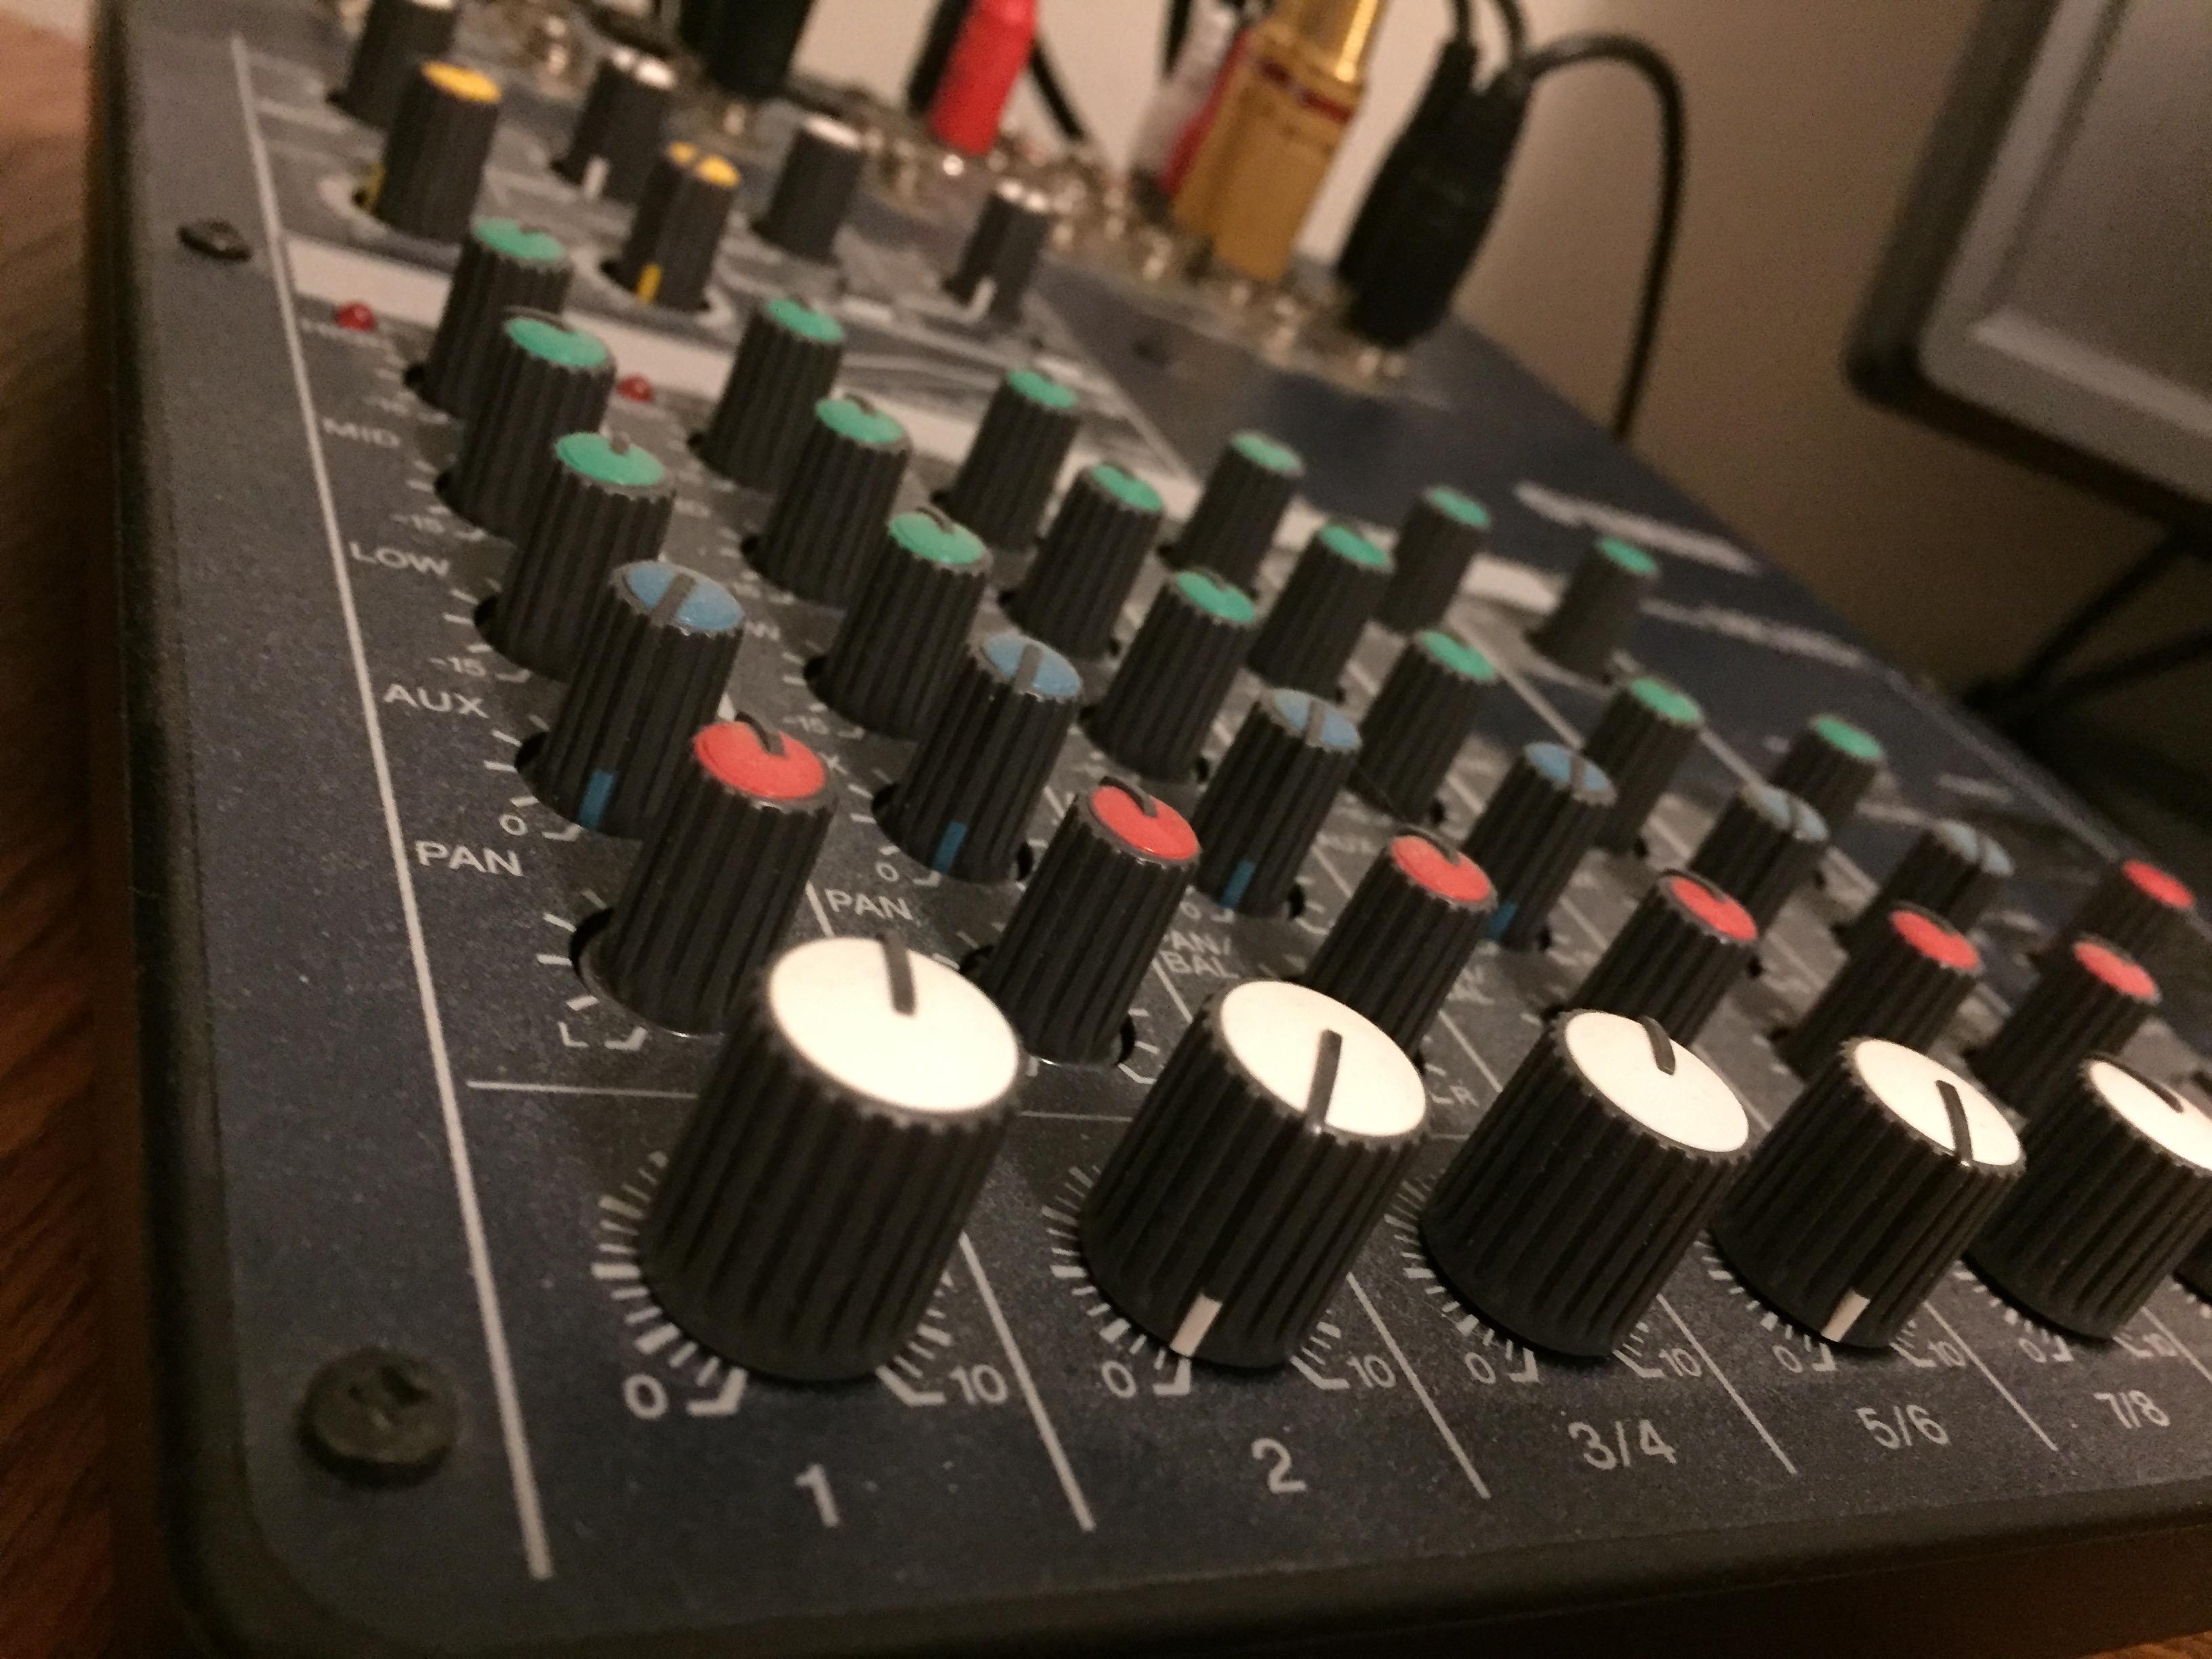 Yamaha MG102c mixing console